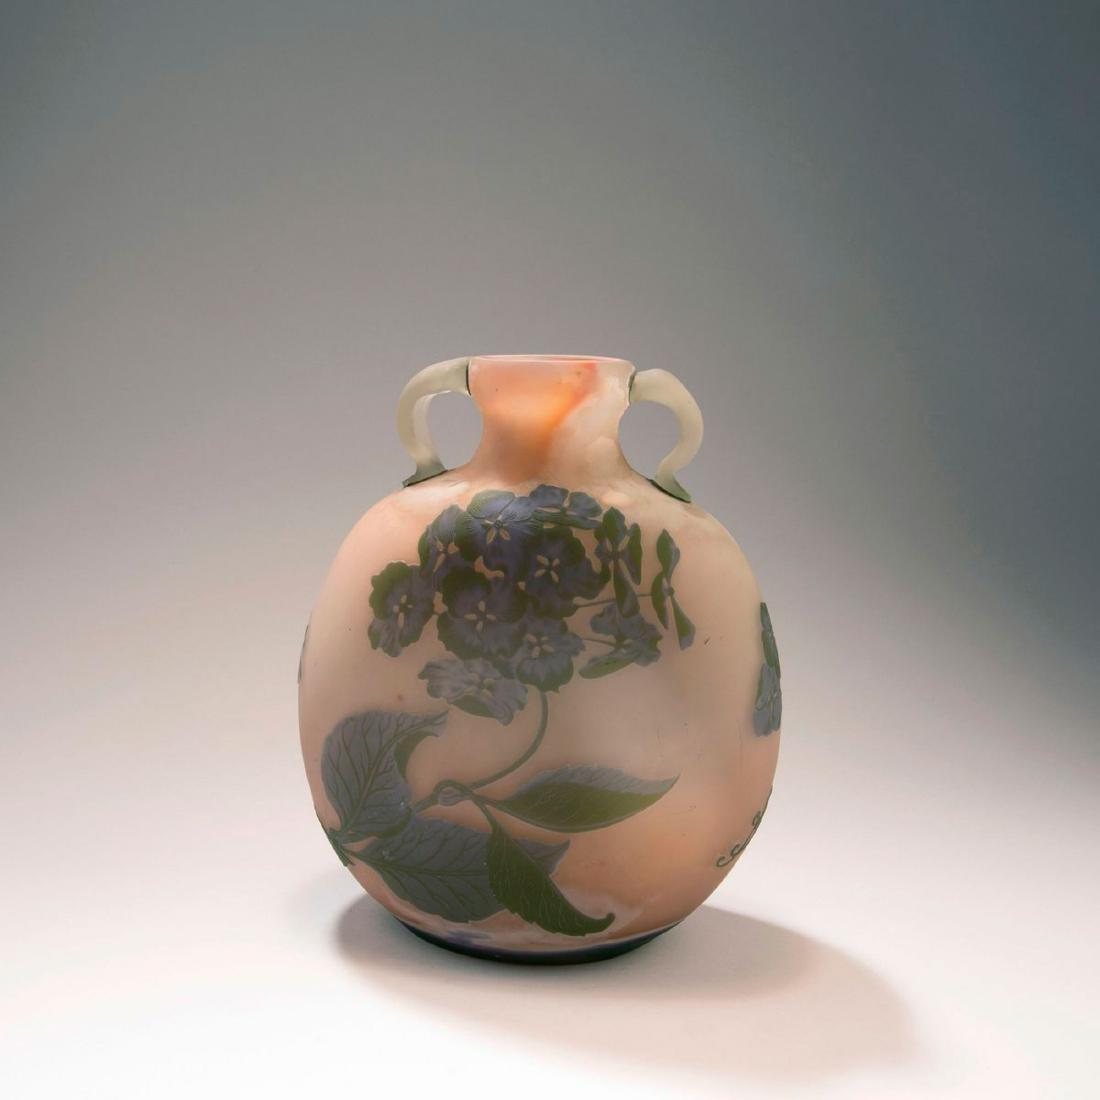 'Hortensias' vase with handles, 1902-03 - 2